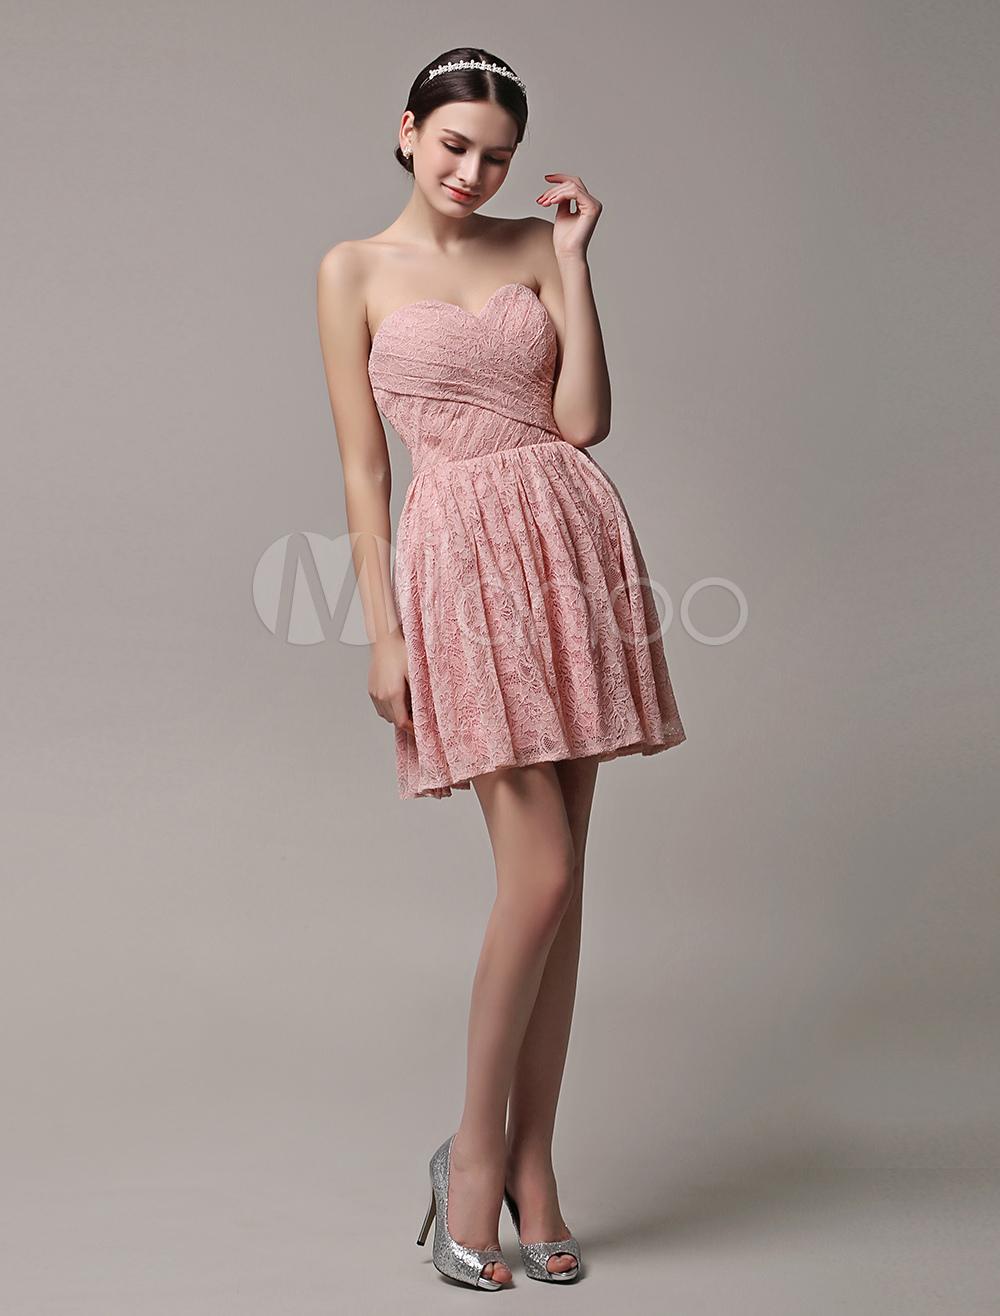 Strapless Bridesmaid Dress Lace Pleated Blush Pink Short Wedding Party Dress (Bridesmaid Dresses) photo